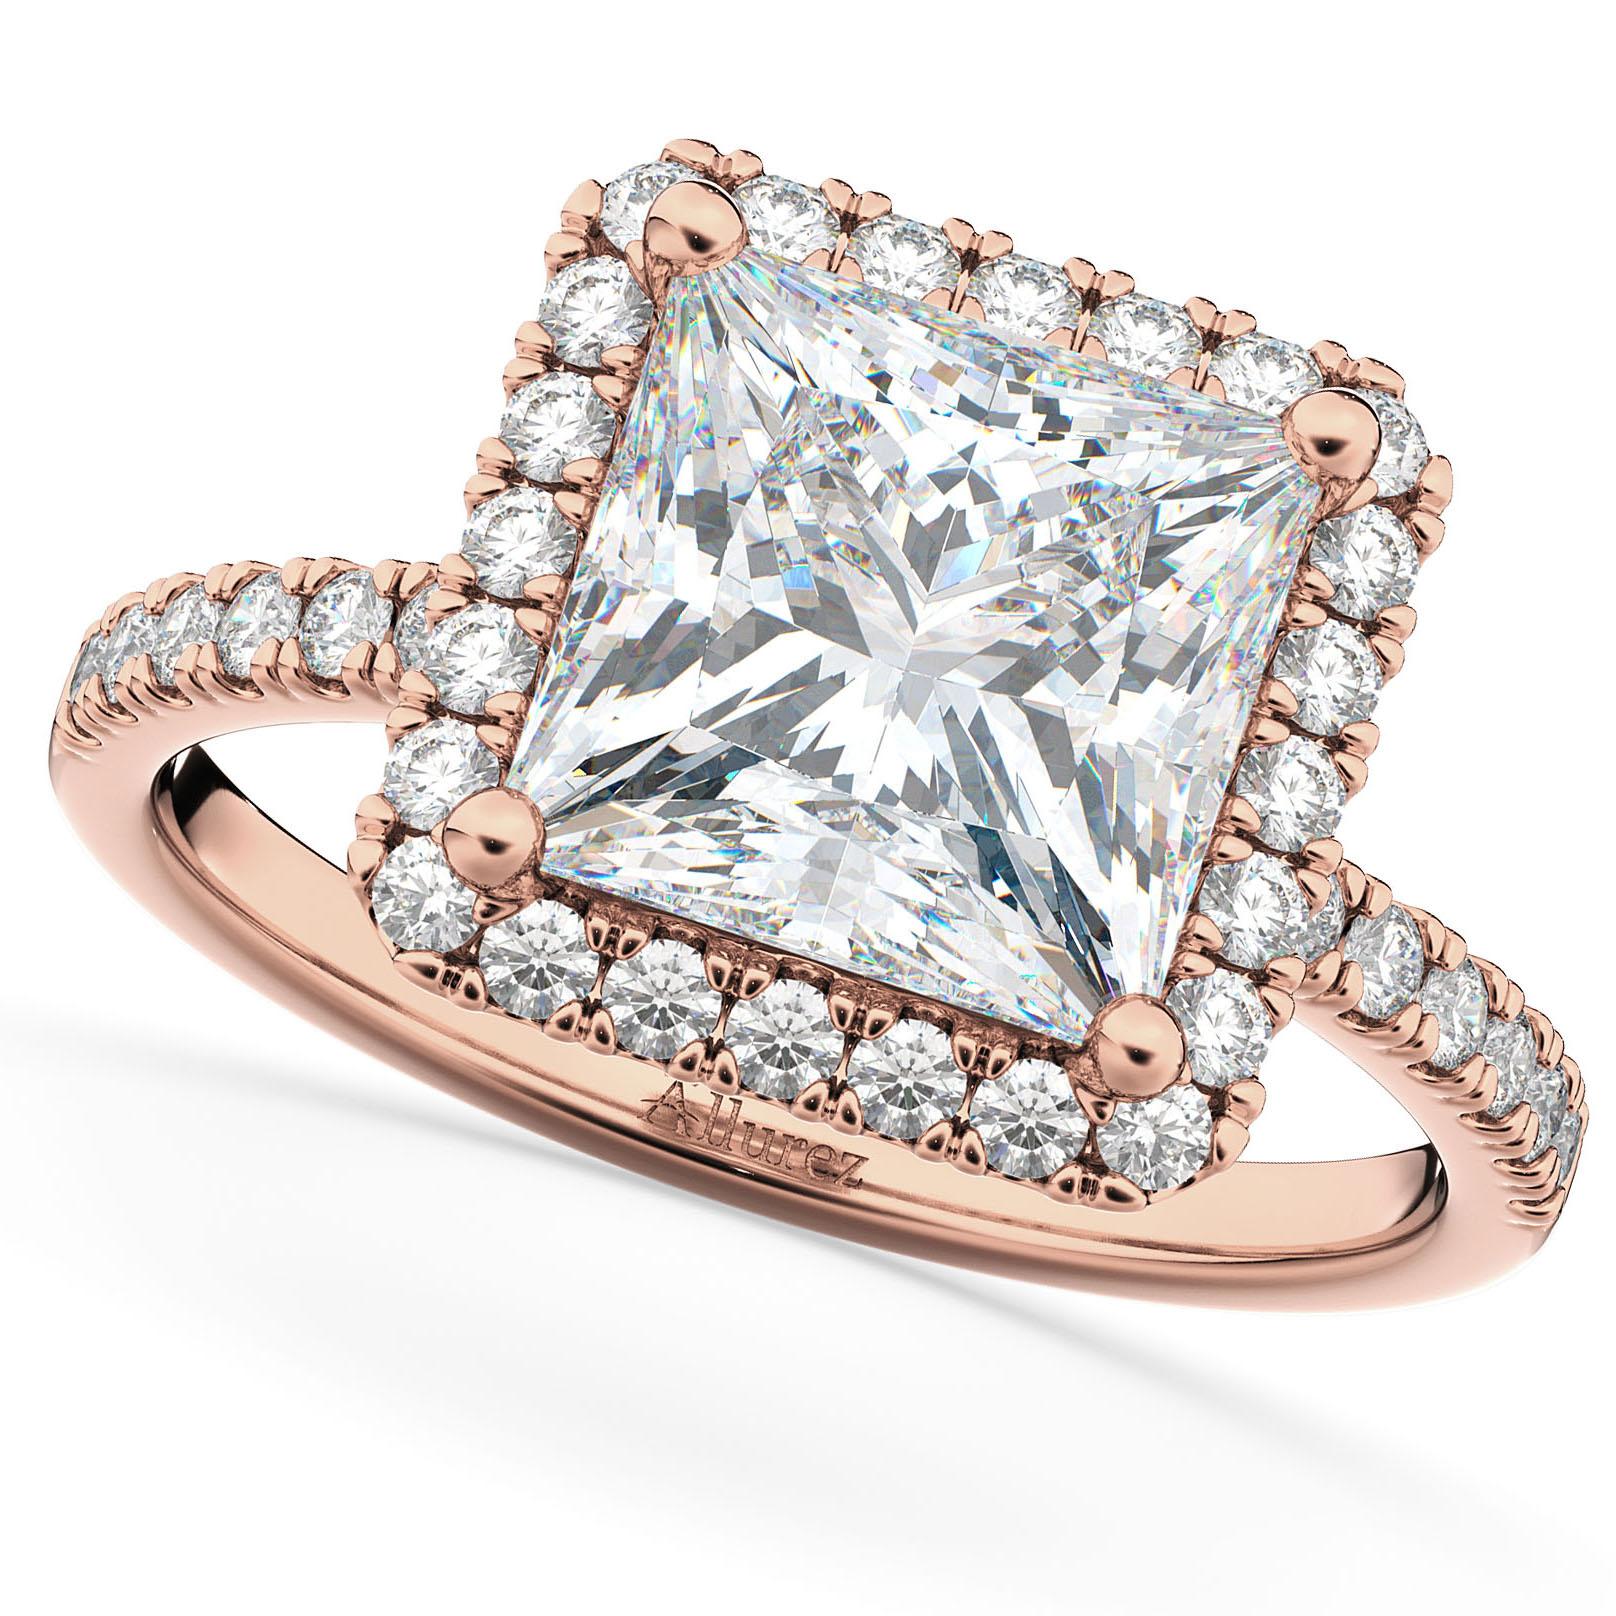 Princess Cut Halo Diamond Engagement Ring 14K Rose Gold (3.58ct)